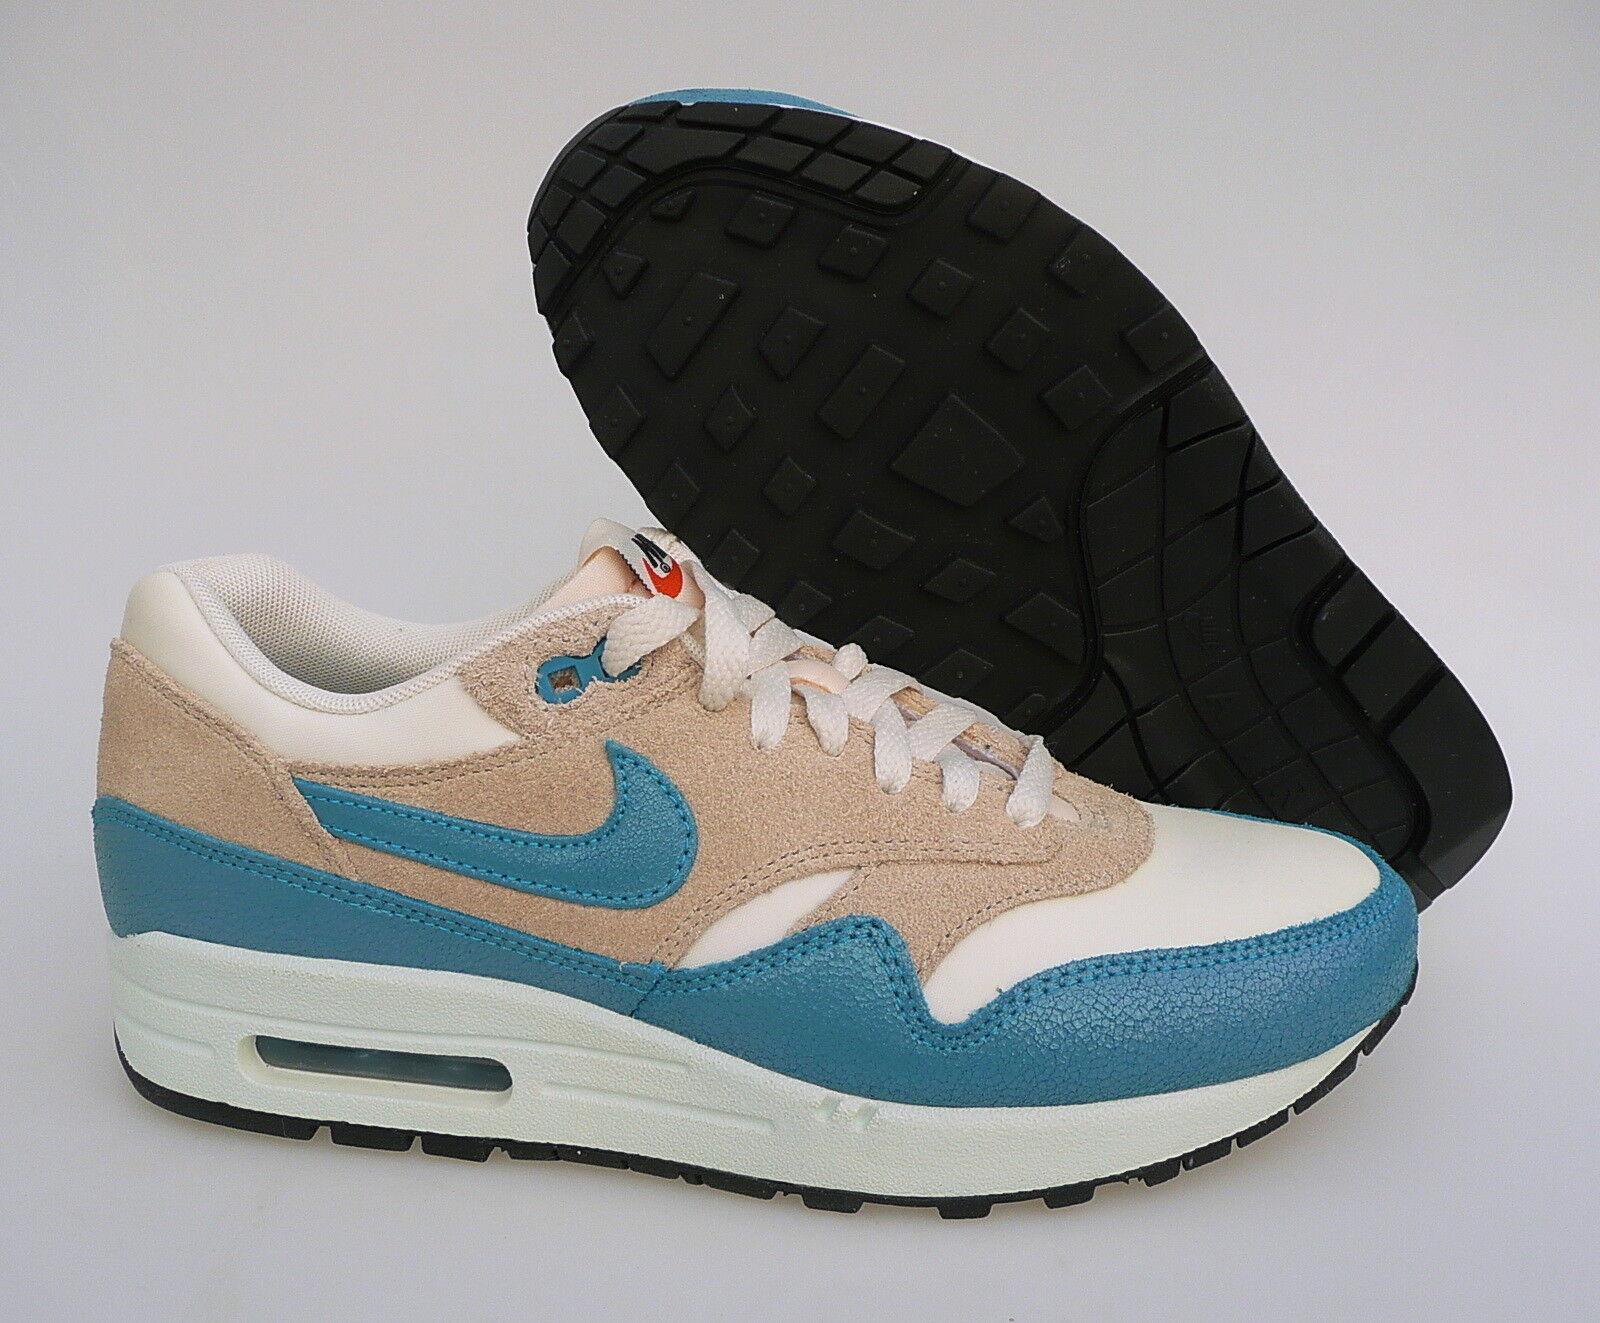 Nike Air Max turquesa 1 vintage cortos zapatos Mesh Antik turquesa Max GR 40 2cbbba